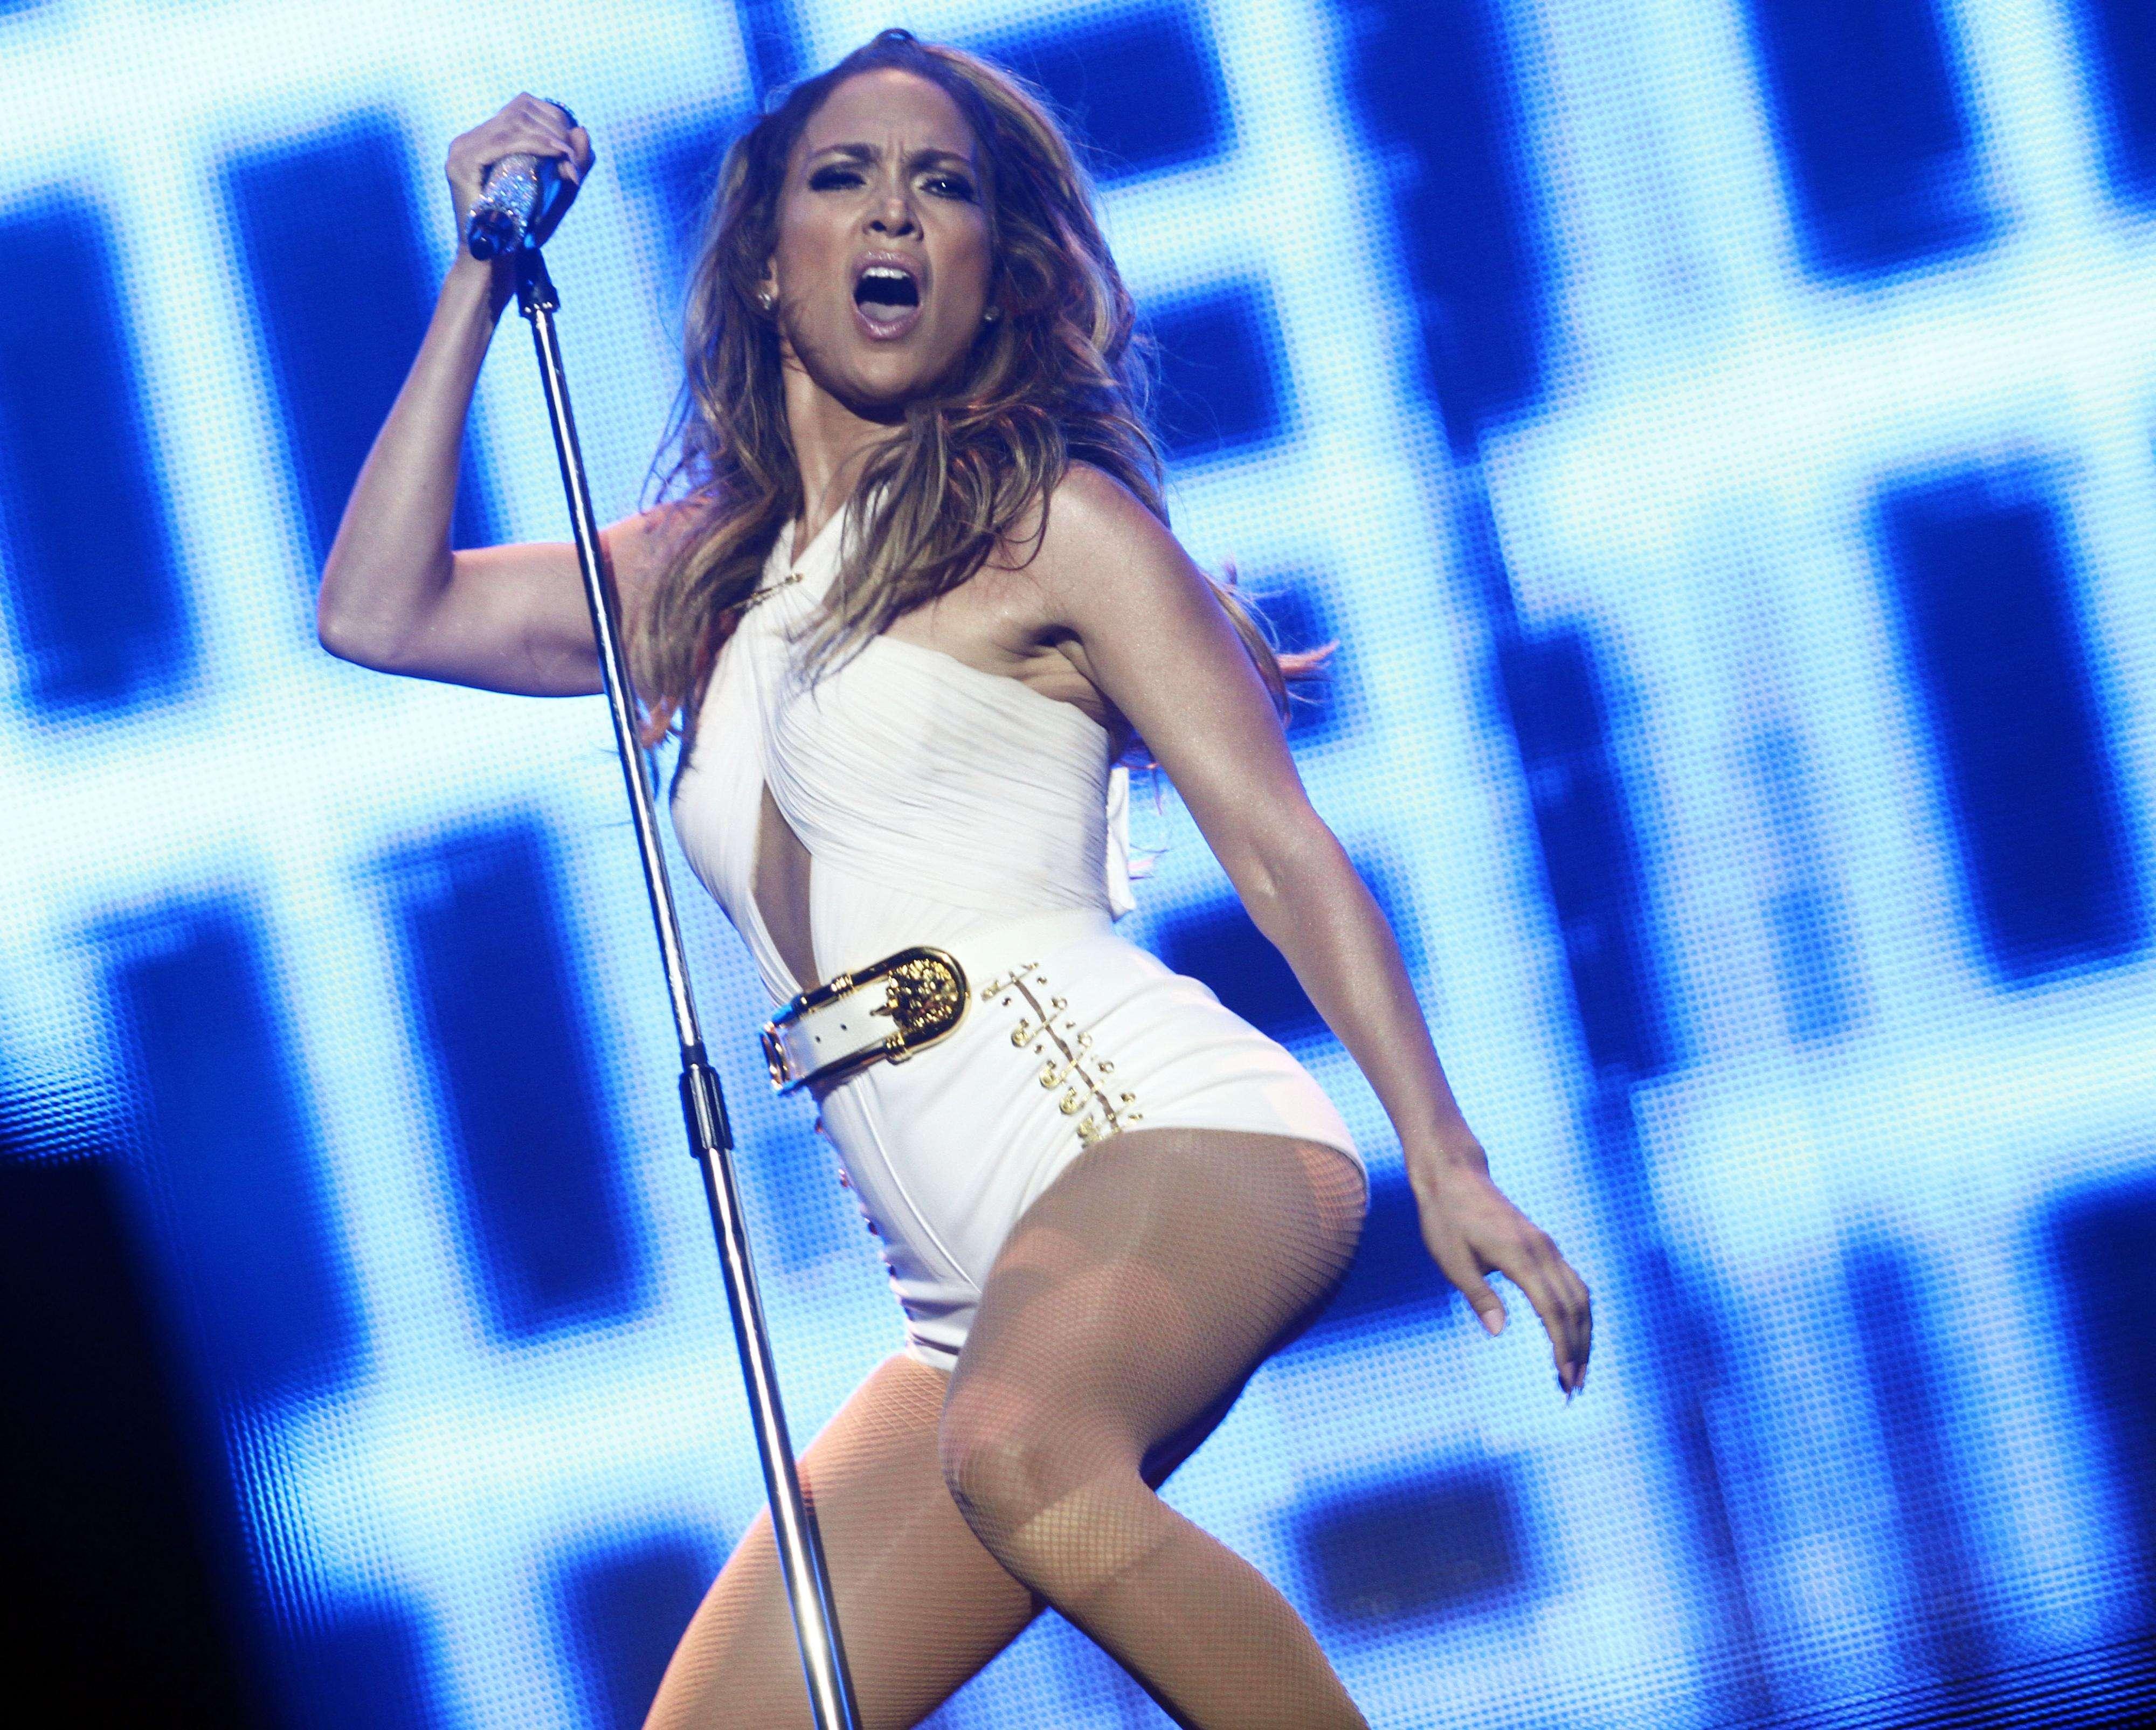 Jennifer Lopez arrebenta durante show em Singapura Foto: Getty Images